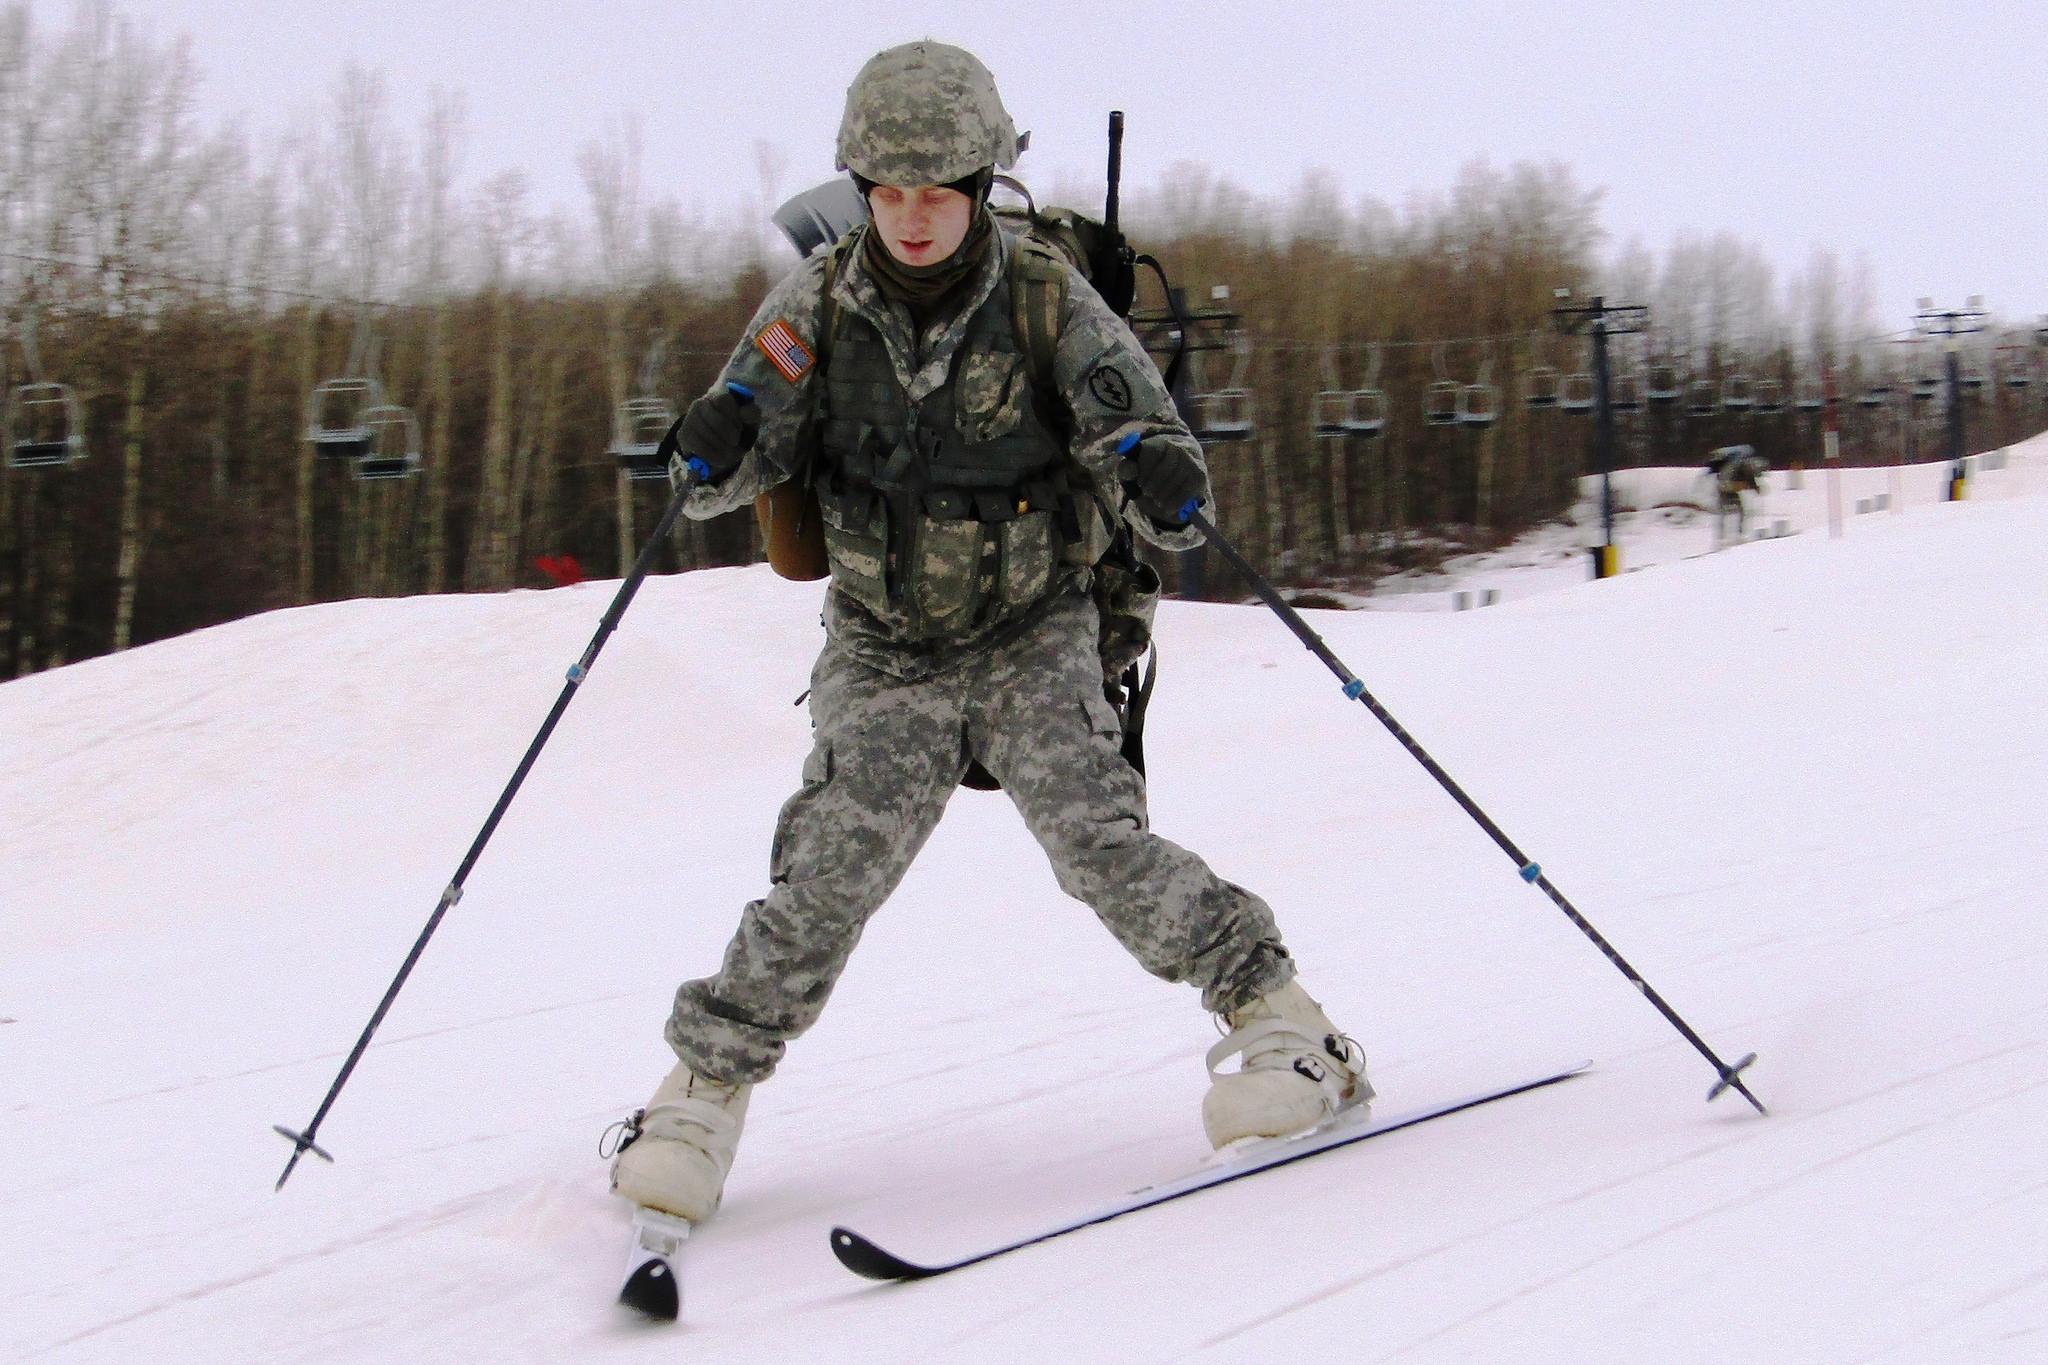 2016 USARAK Winter Games, by U.S. Army Alaska (USARAK)